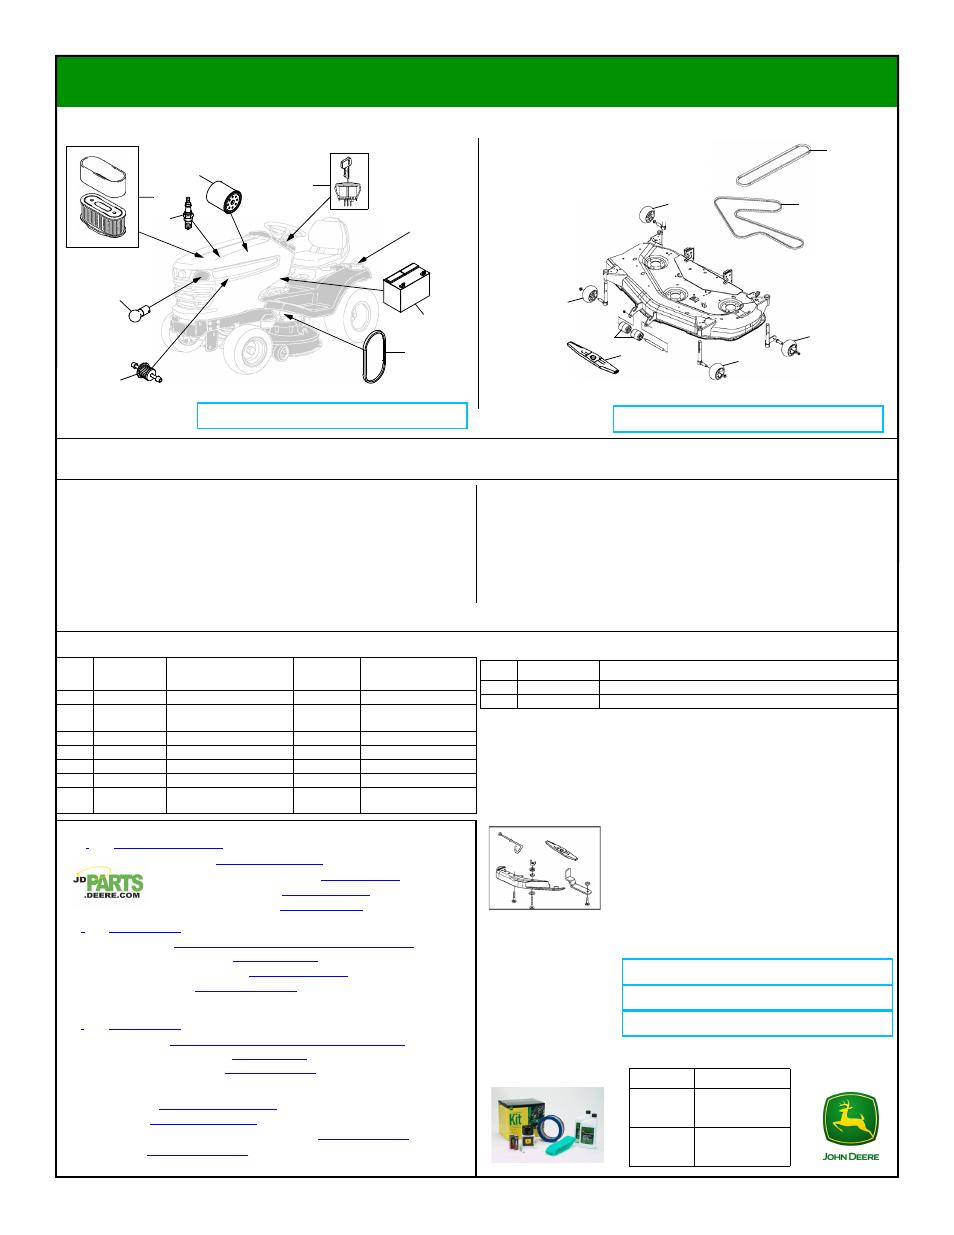 John Deere X320 Service Manual Best Deer Photos Wiring Diagram User 1 Page